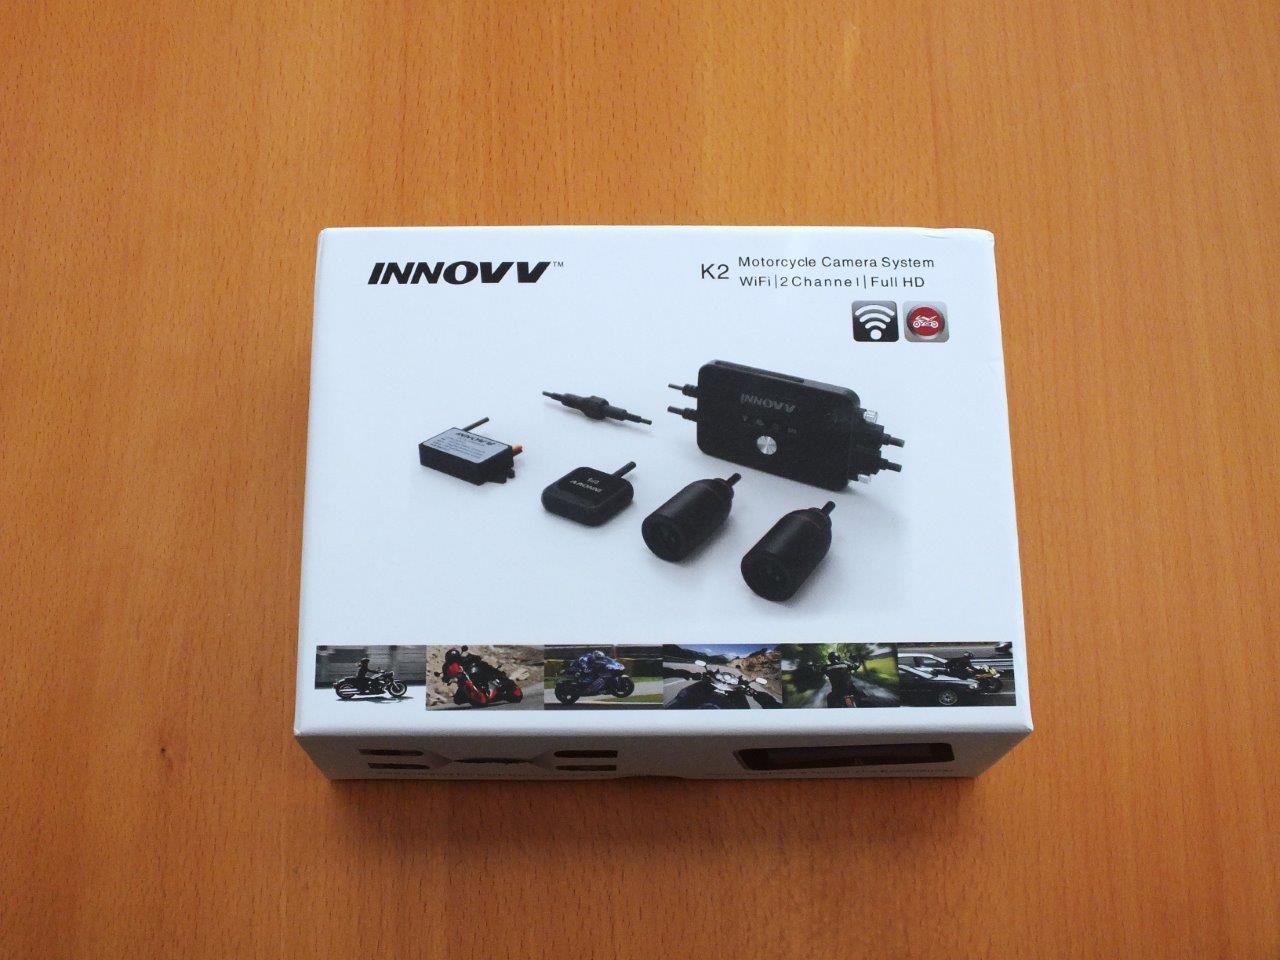 INNOV K2 Motorcycle Camera Retail Box